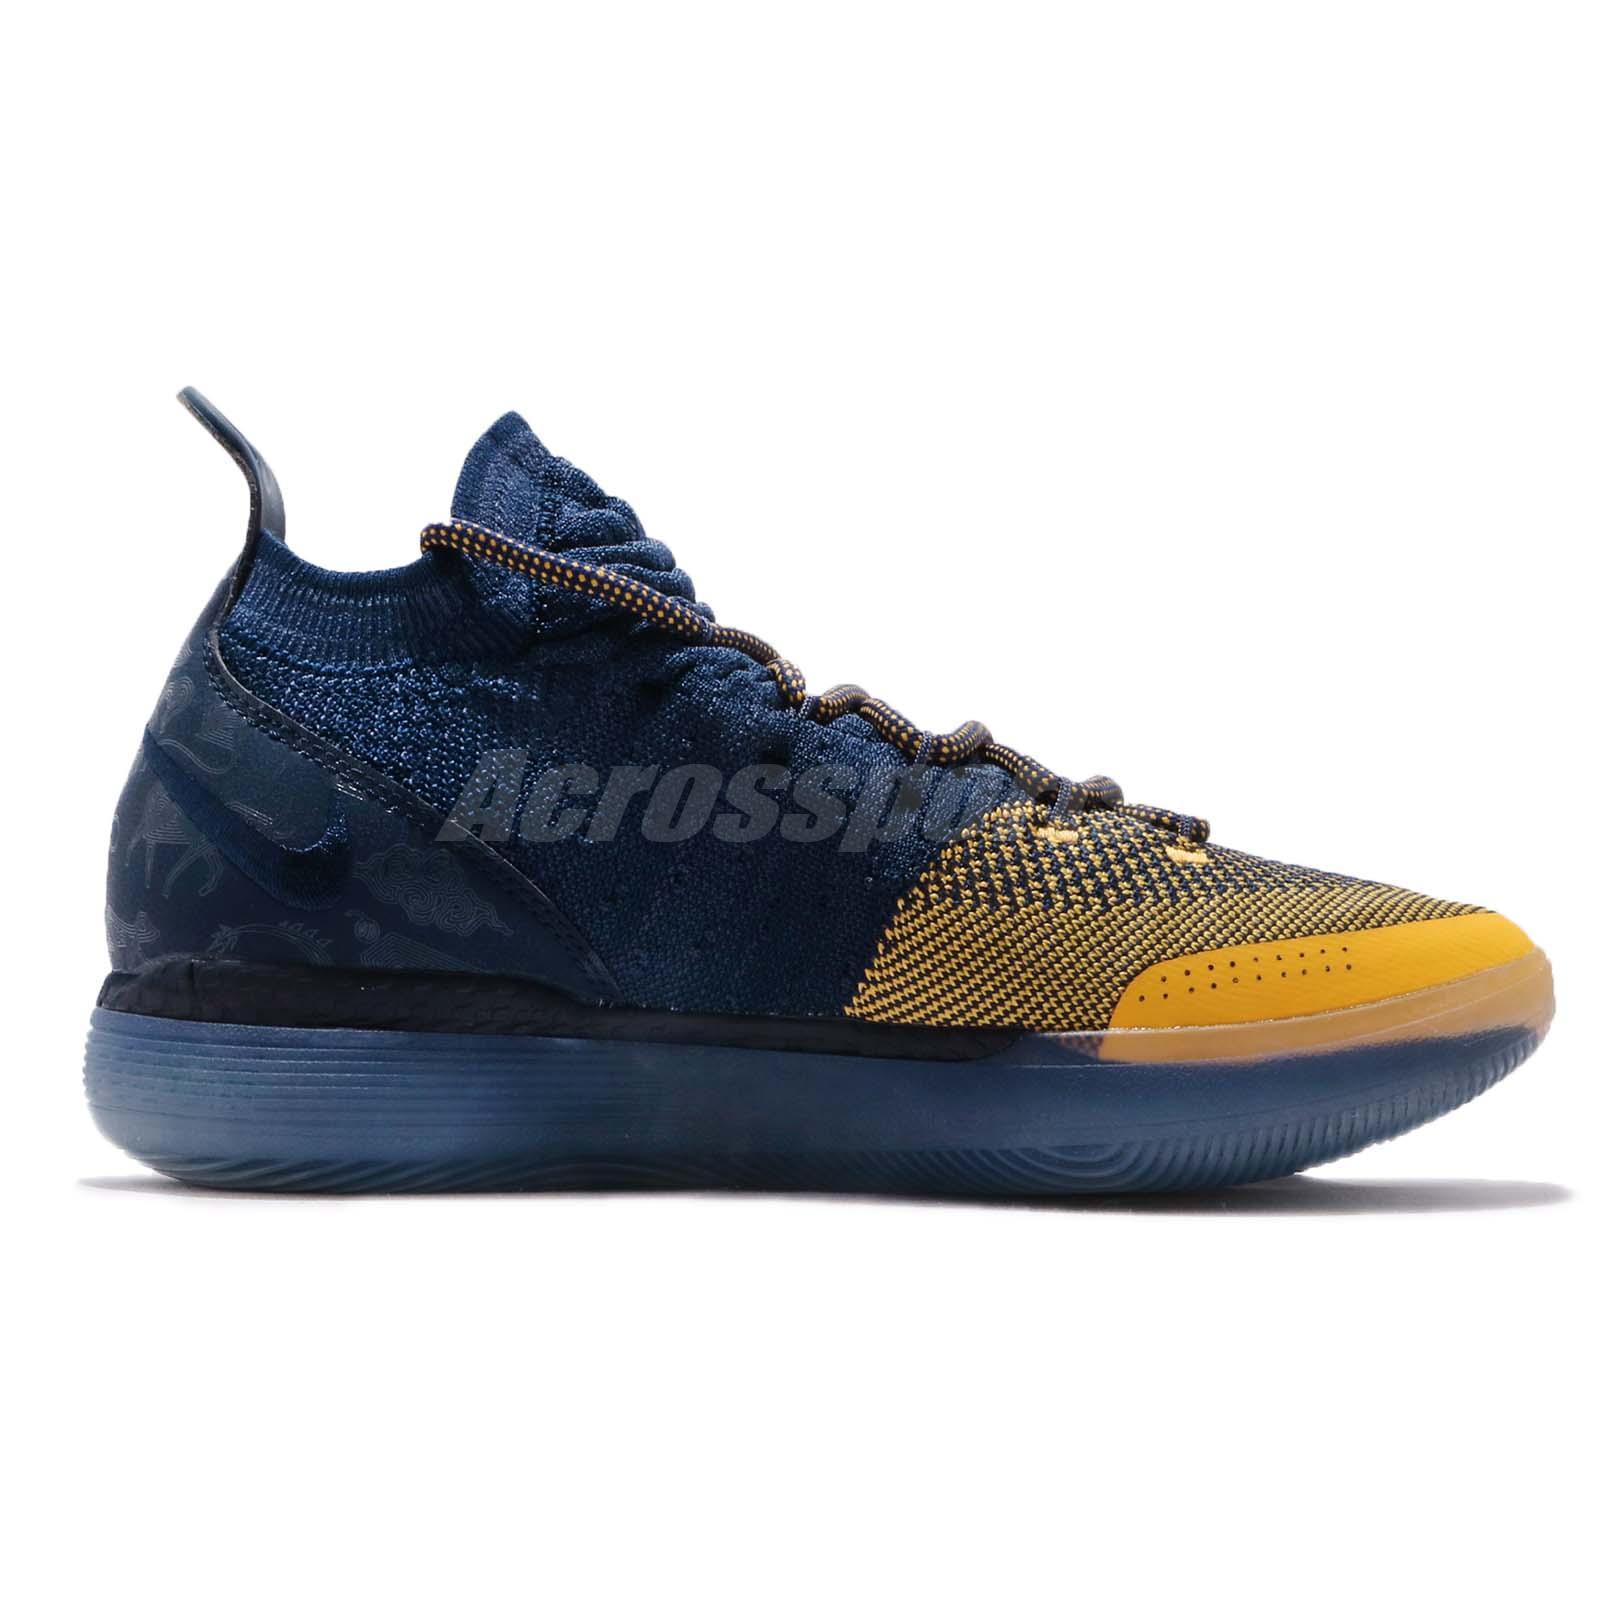 2f1b0bae7fad24 Nike Zoom KD 11 EP XI Chinese Zodiac Michigan Kevin Durant Navy ...